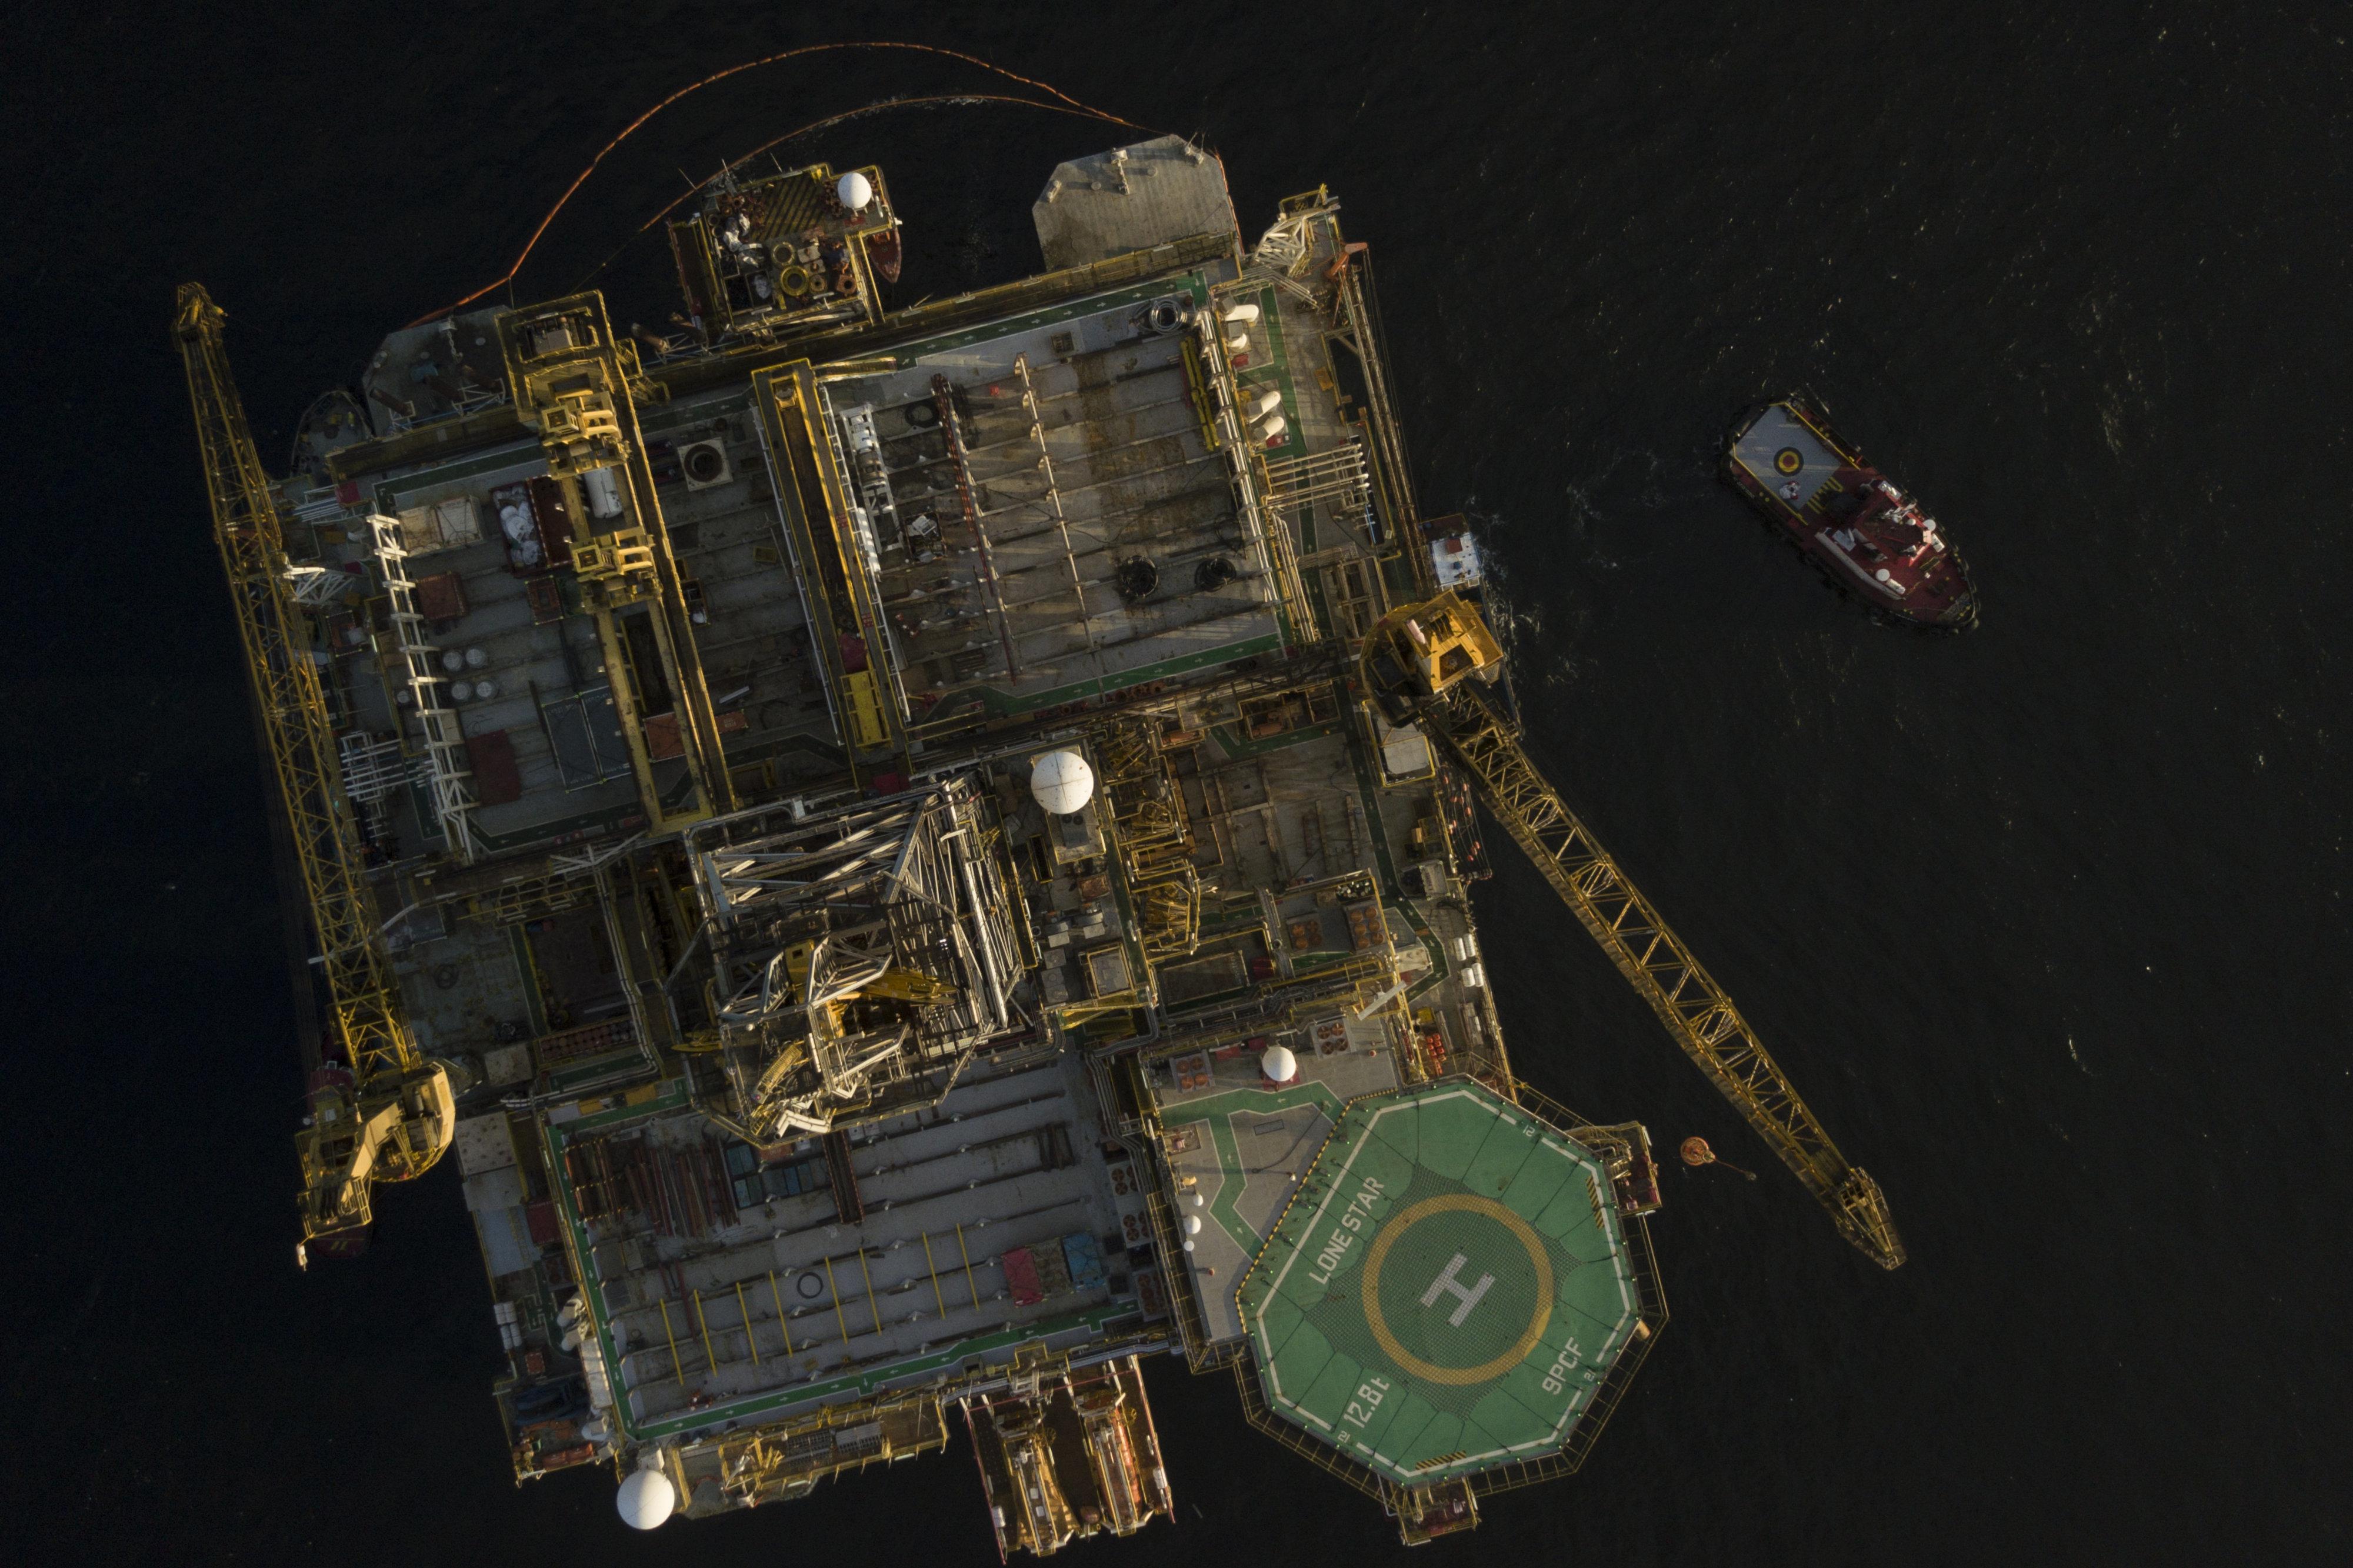 Exxonmobil: Να πως γίνεται η έρευνα για κοιτάσματα πετρελαίου και φυσικού